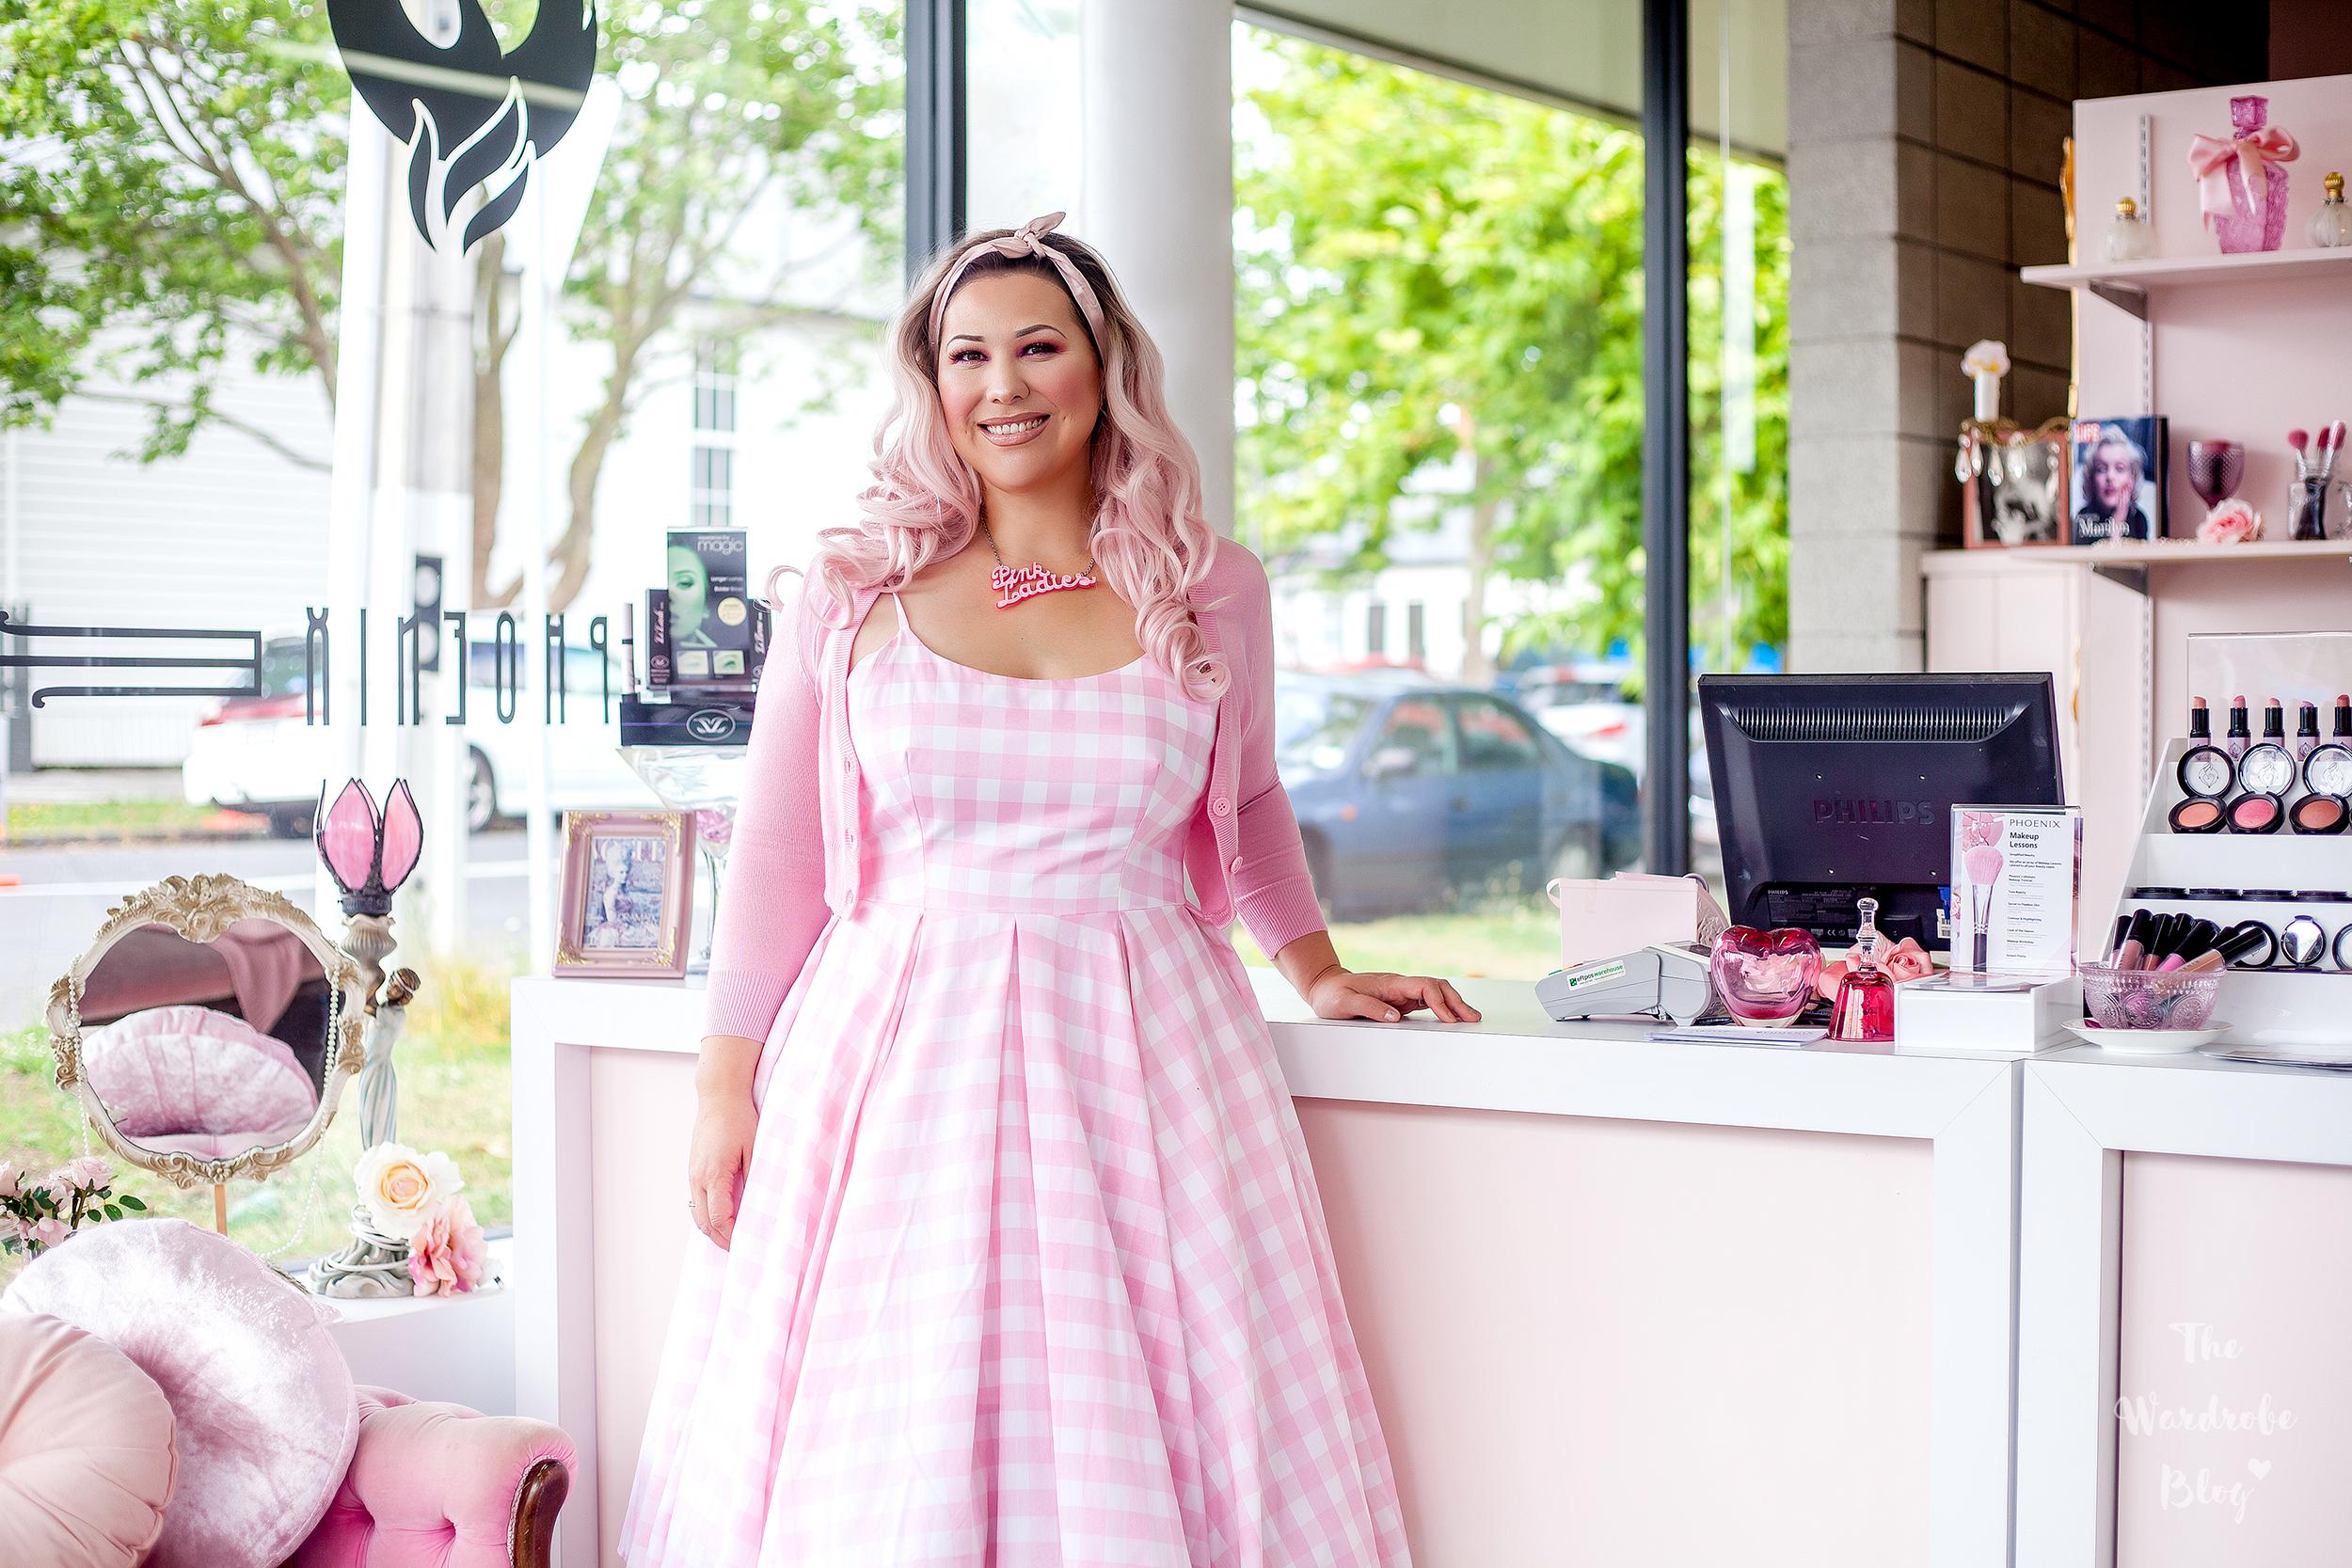 Phoenix-Renata-Cosmetics-Interview-Counter